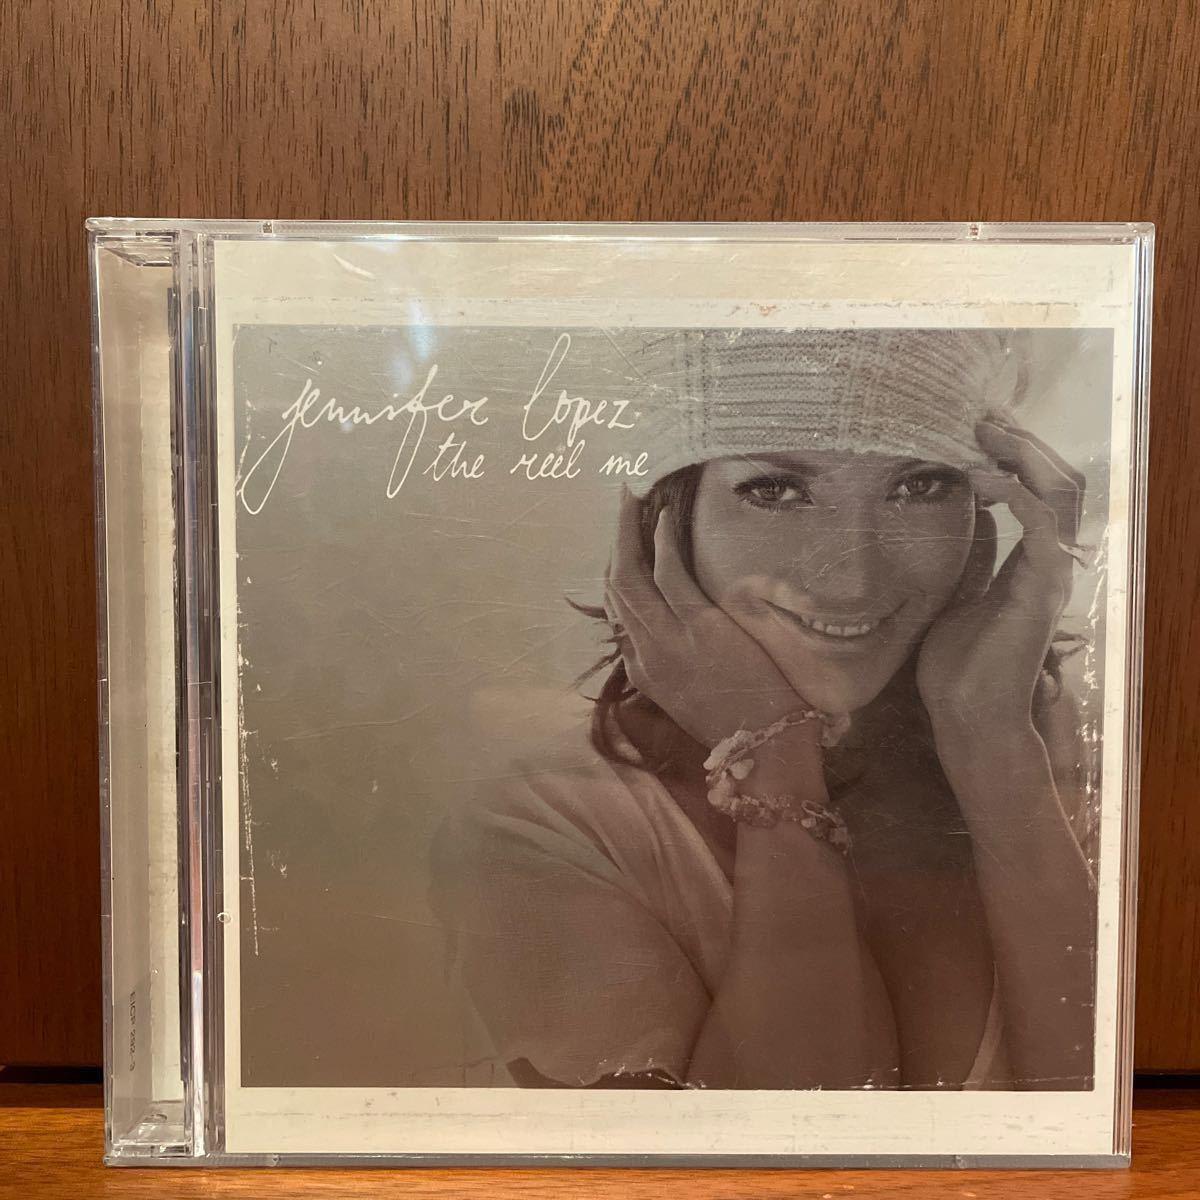 The Reel Me [CD+DVD] Jennifer Lopez